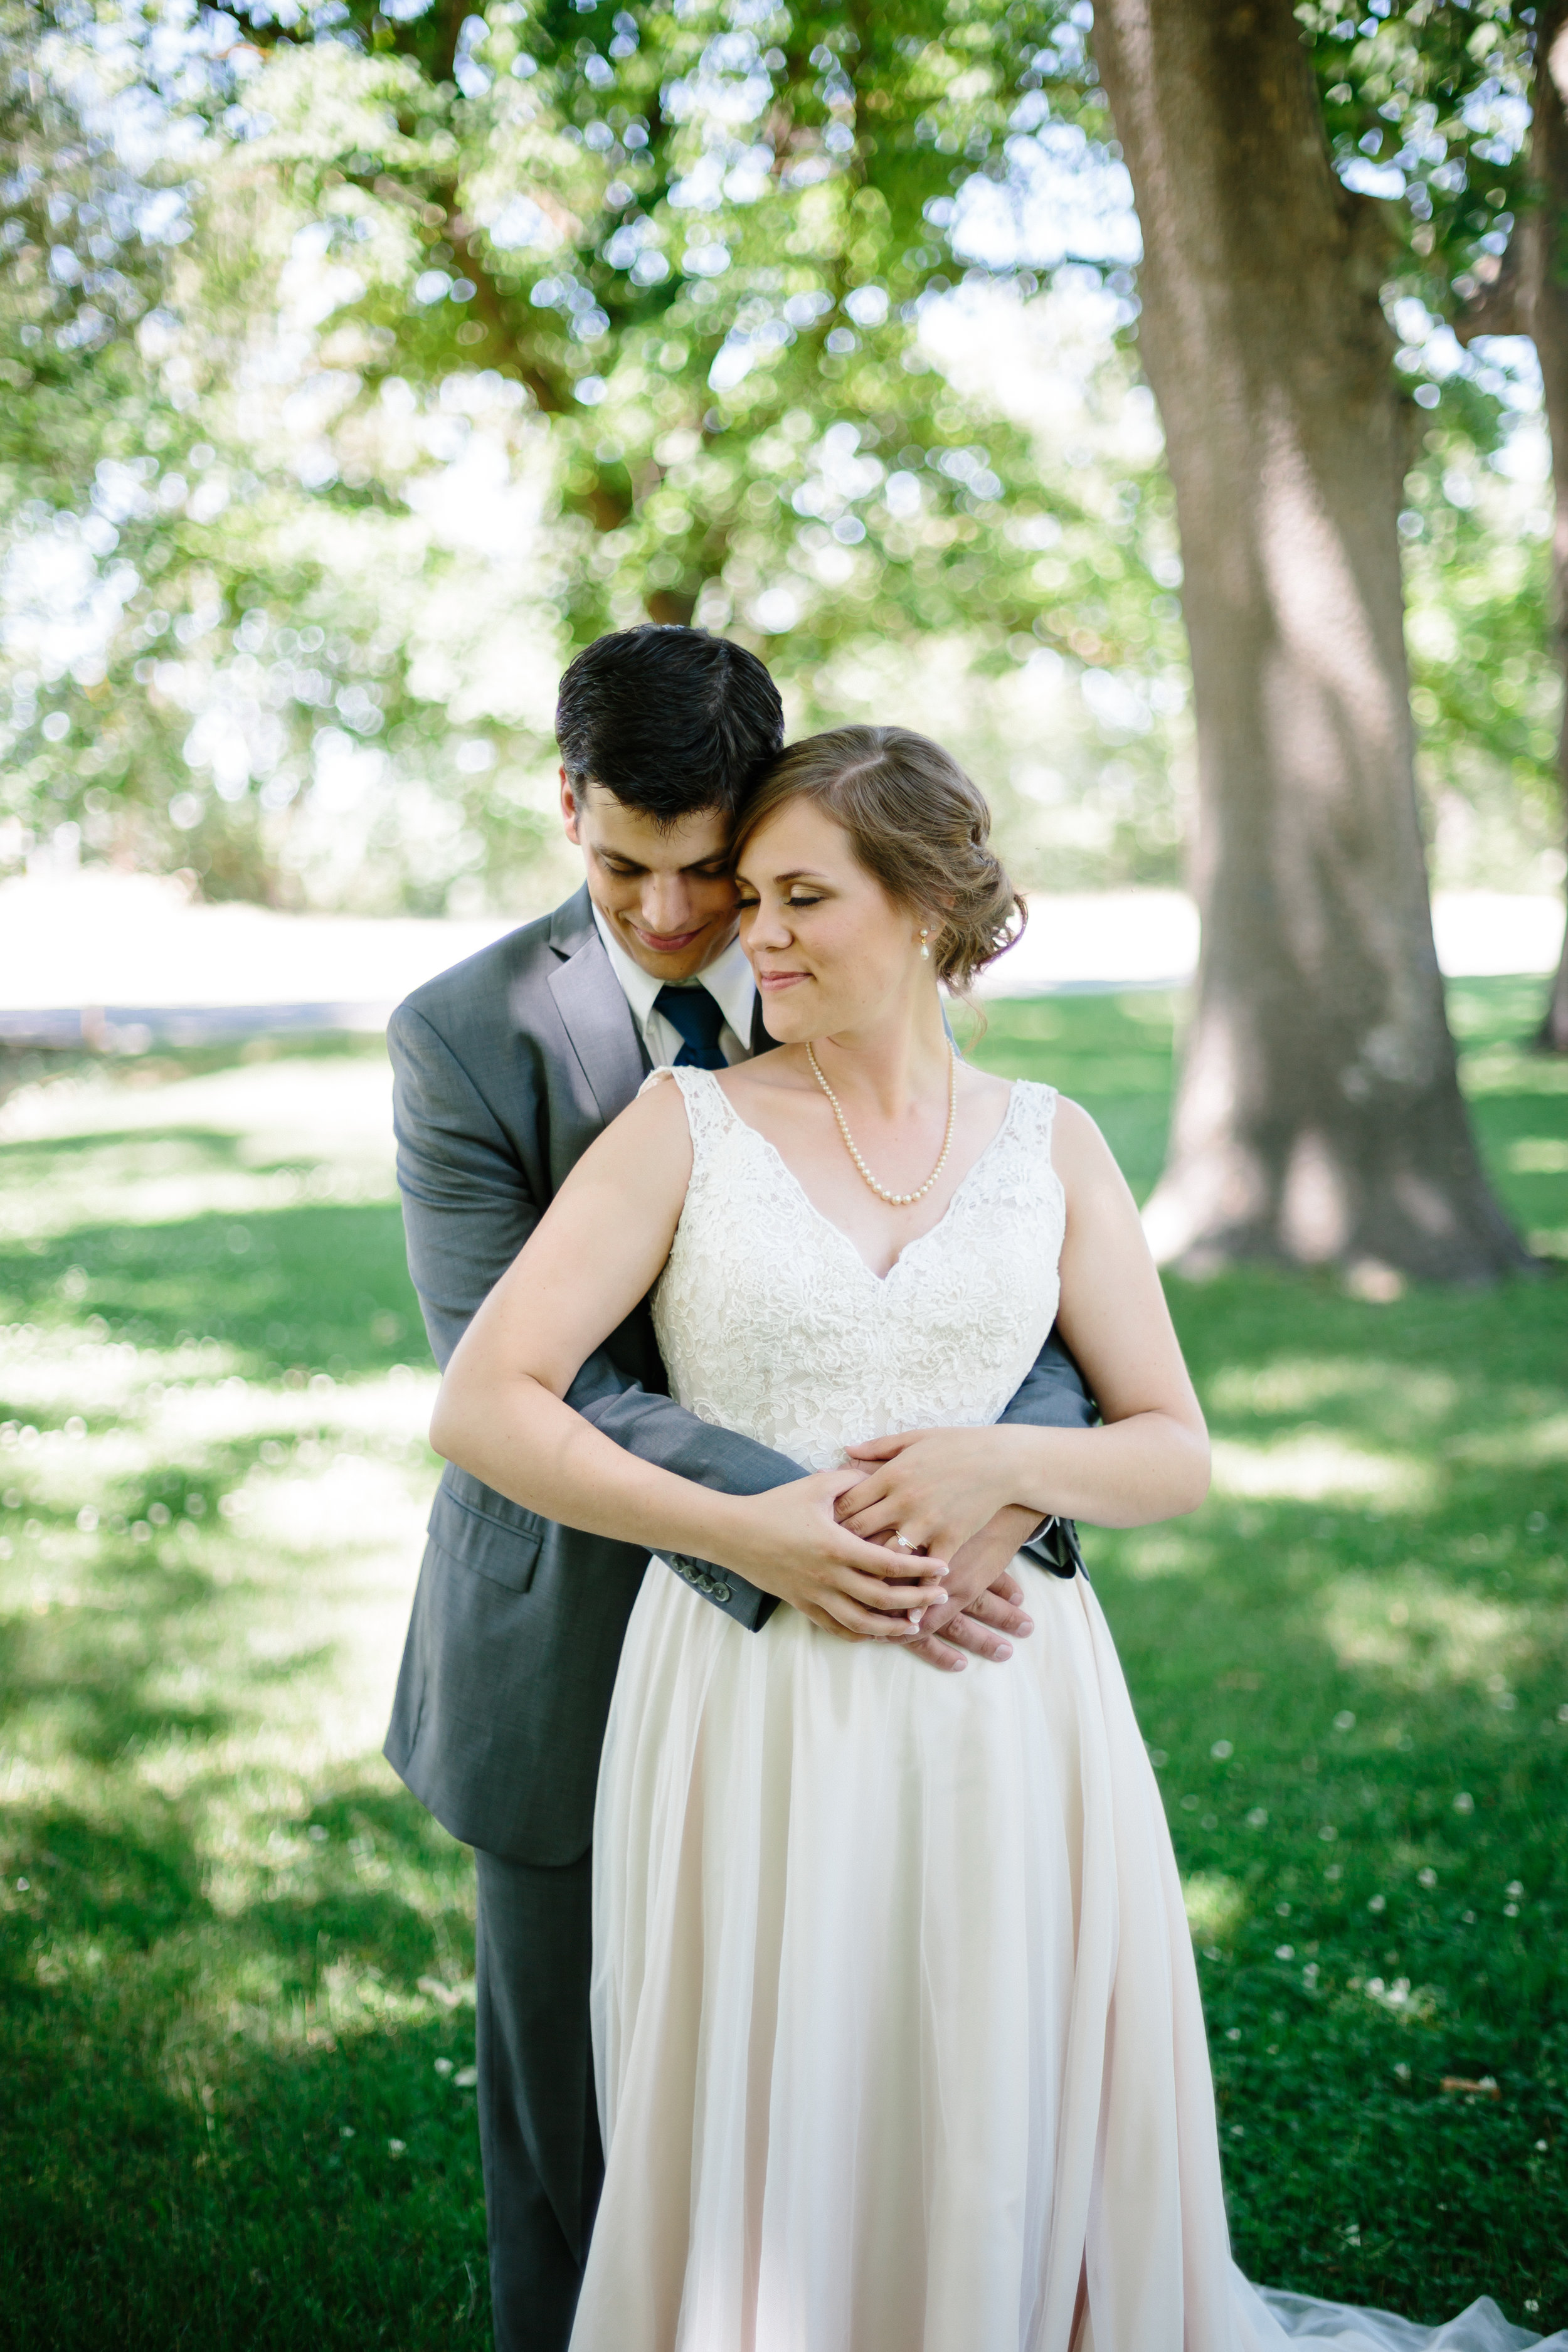 Jordan & Shantel Married - Idaho - Corrie Mick Photography-100.jpg